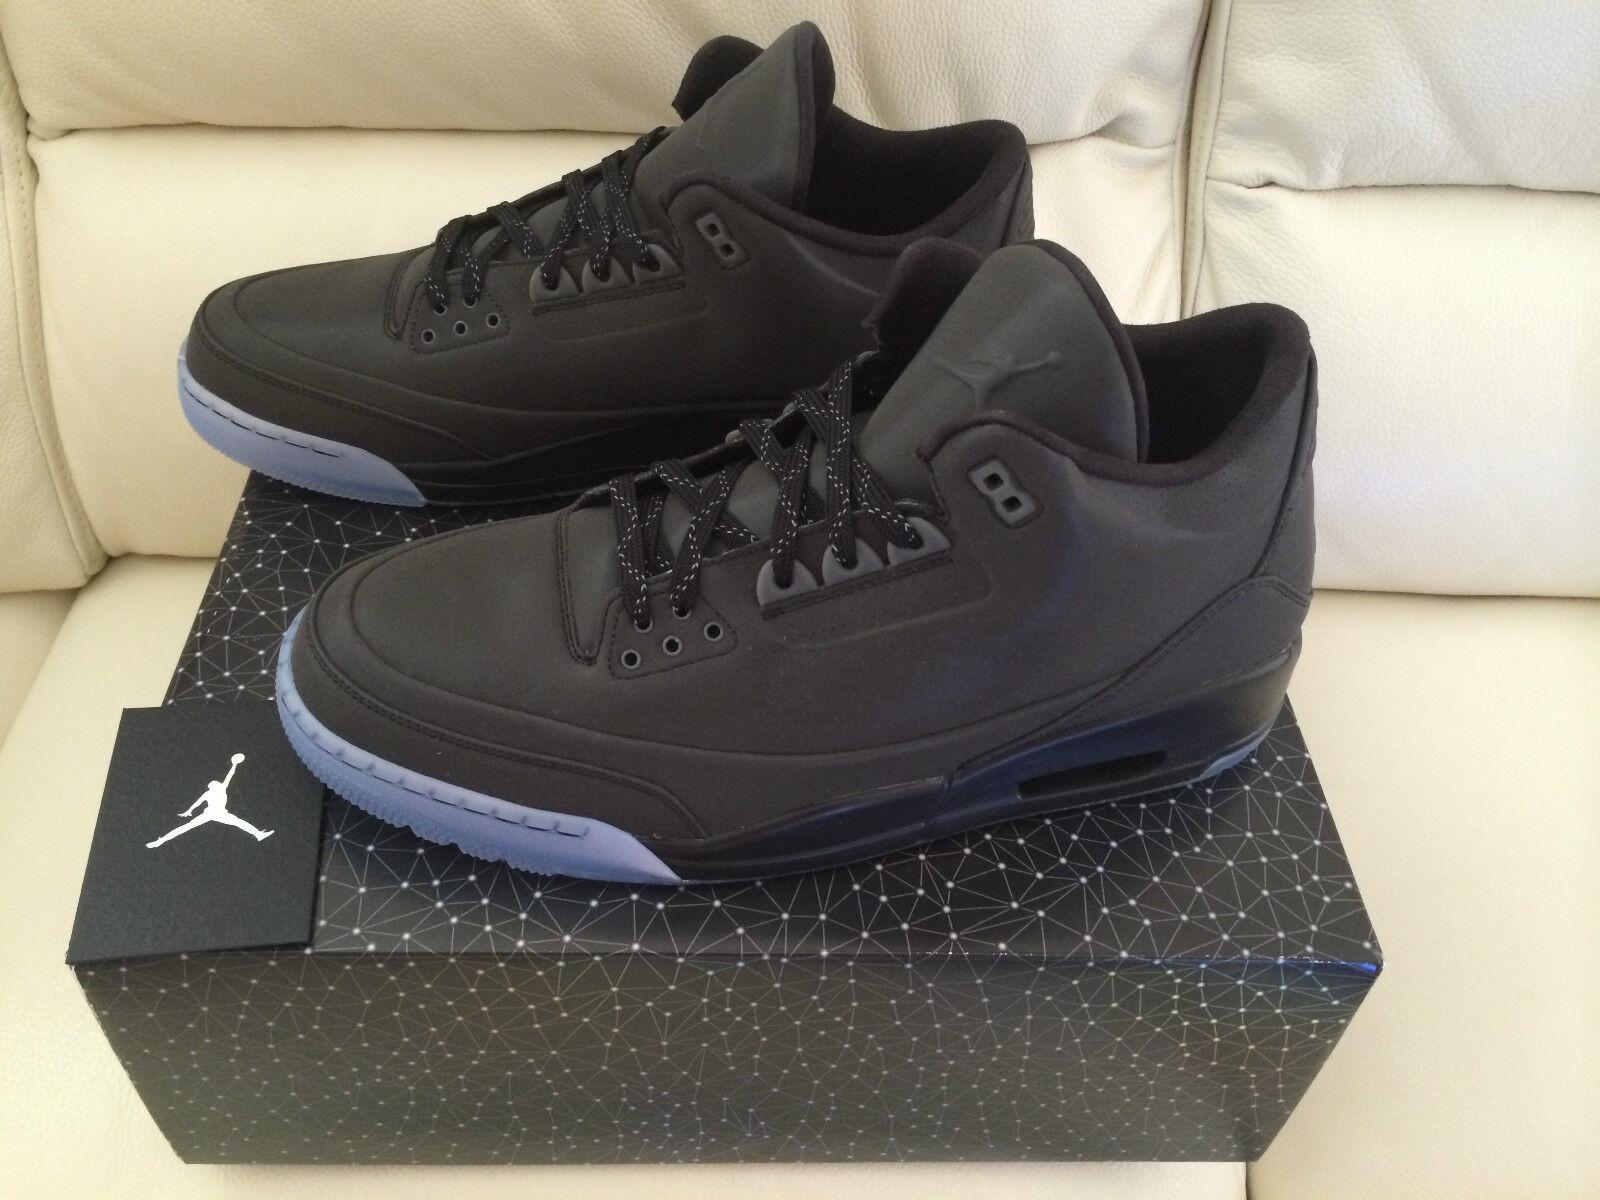 Nike Air Jordan 5LAB3 t entraineHommes t 5LAB3 baskets taille us 14 neuf ** look ** 77aa5b